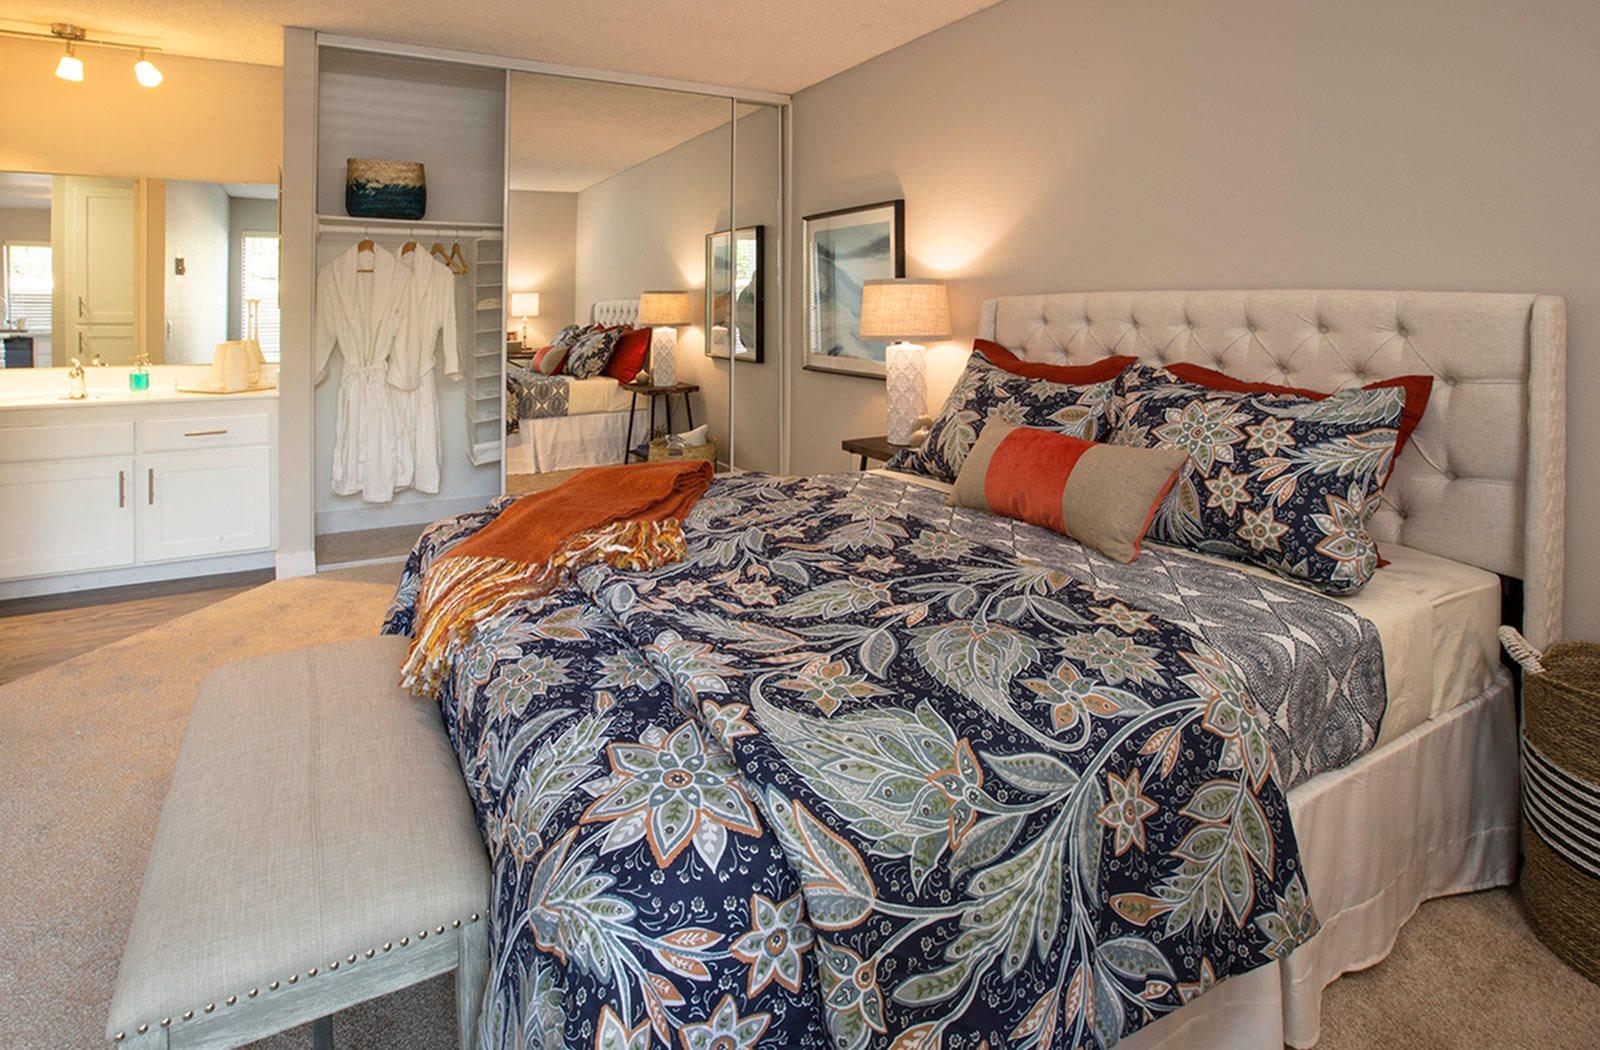 Apartments for rent in west covina ca twelve31 apts - 3 bedroom apartments orange county ...